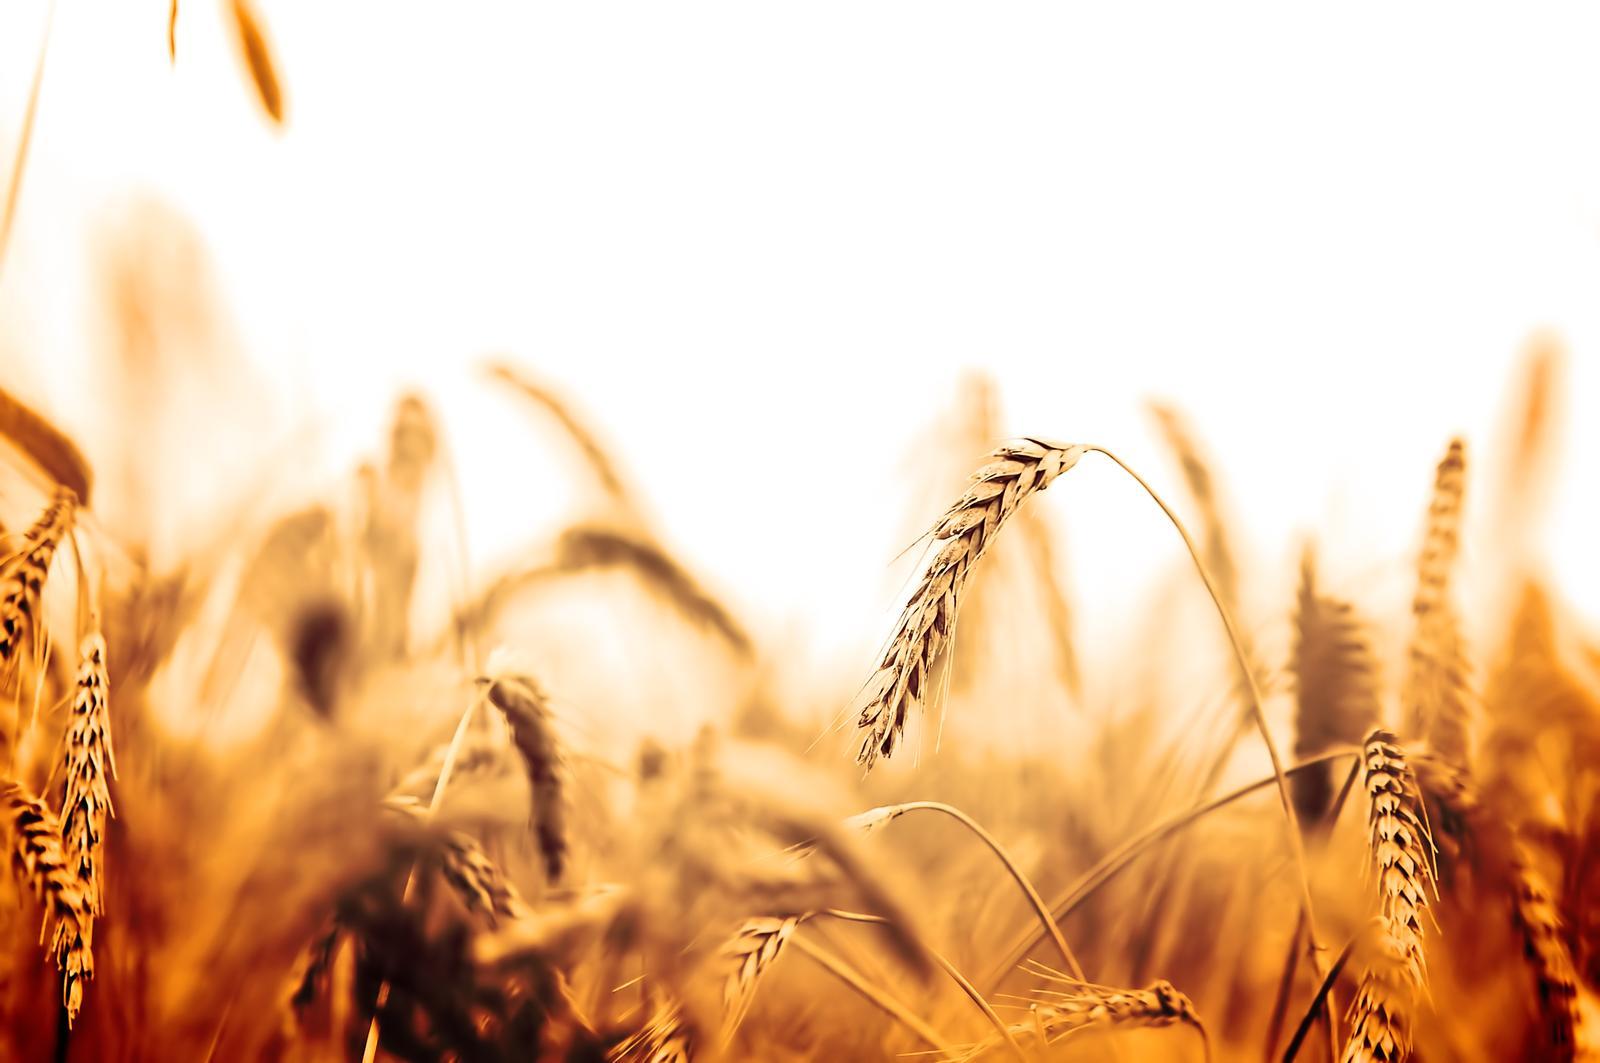 Growing of cereals (except rice), leguminous crops and oil seeds in Lääne-Viru county